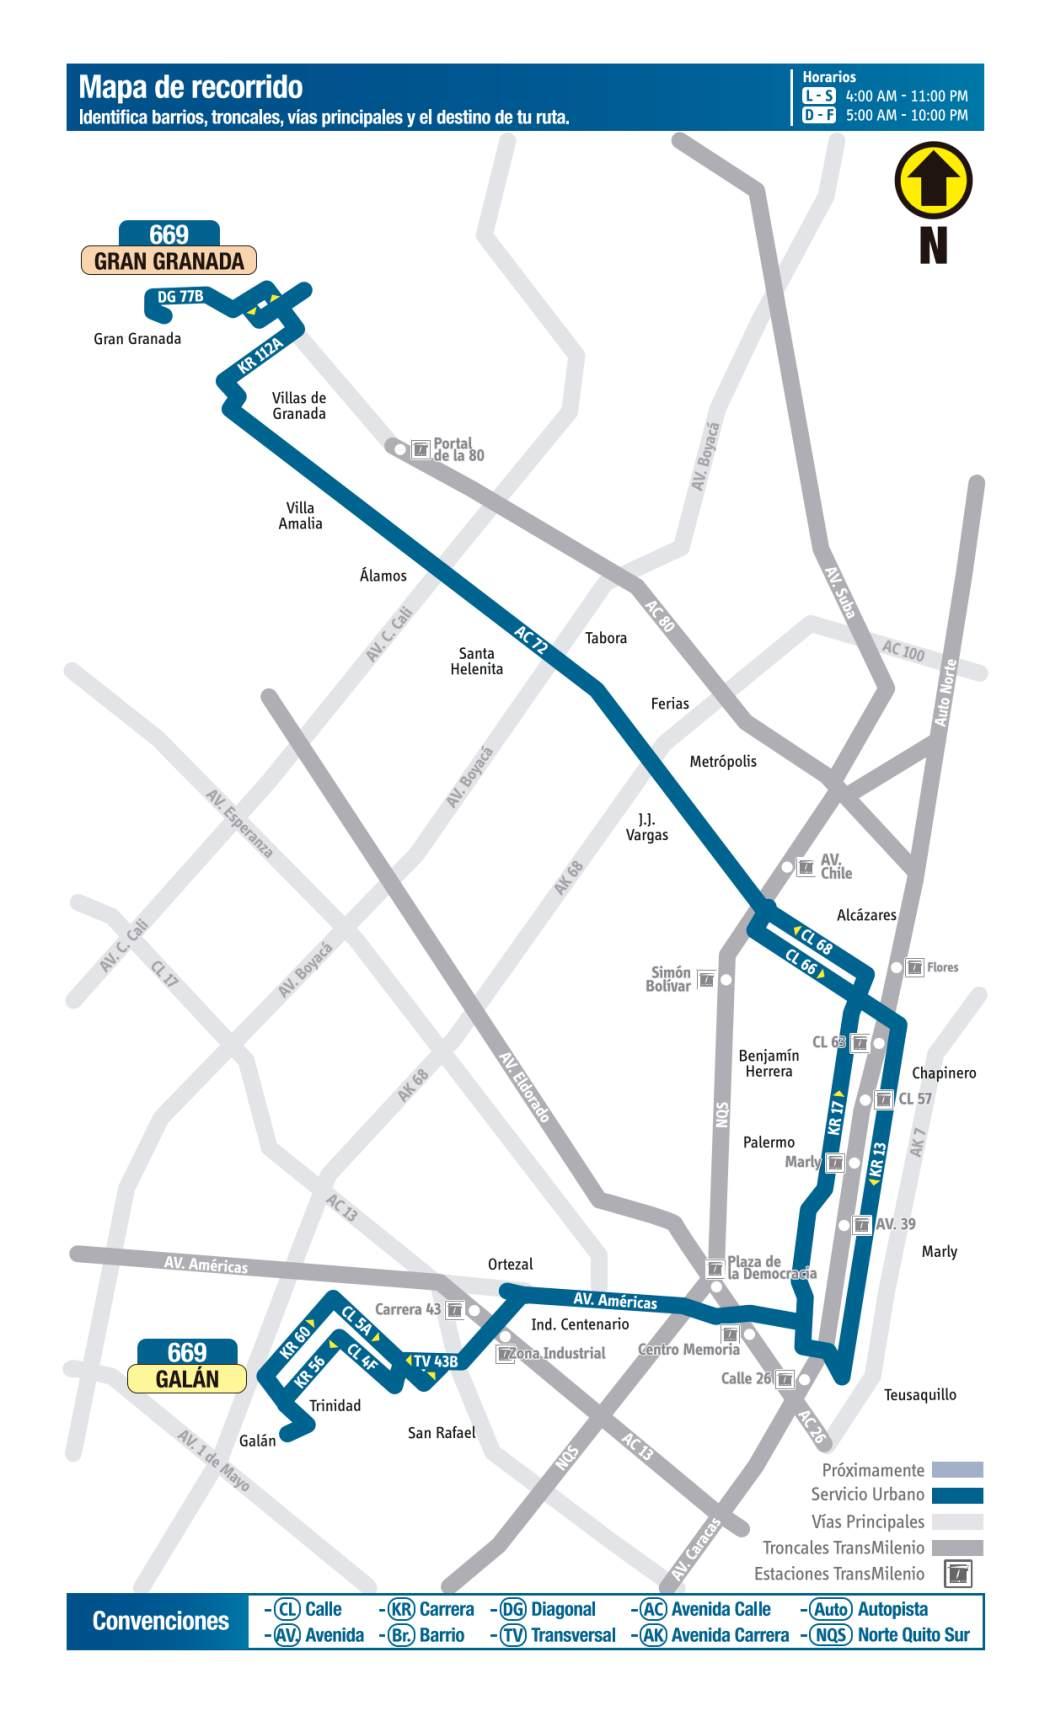 669 Galán - Gran Granada, mapa bus urbano Bogotá